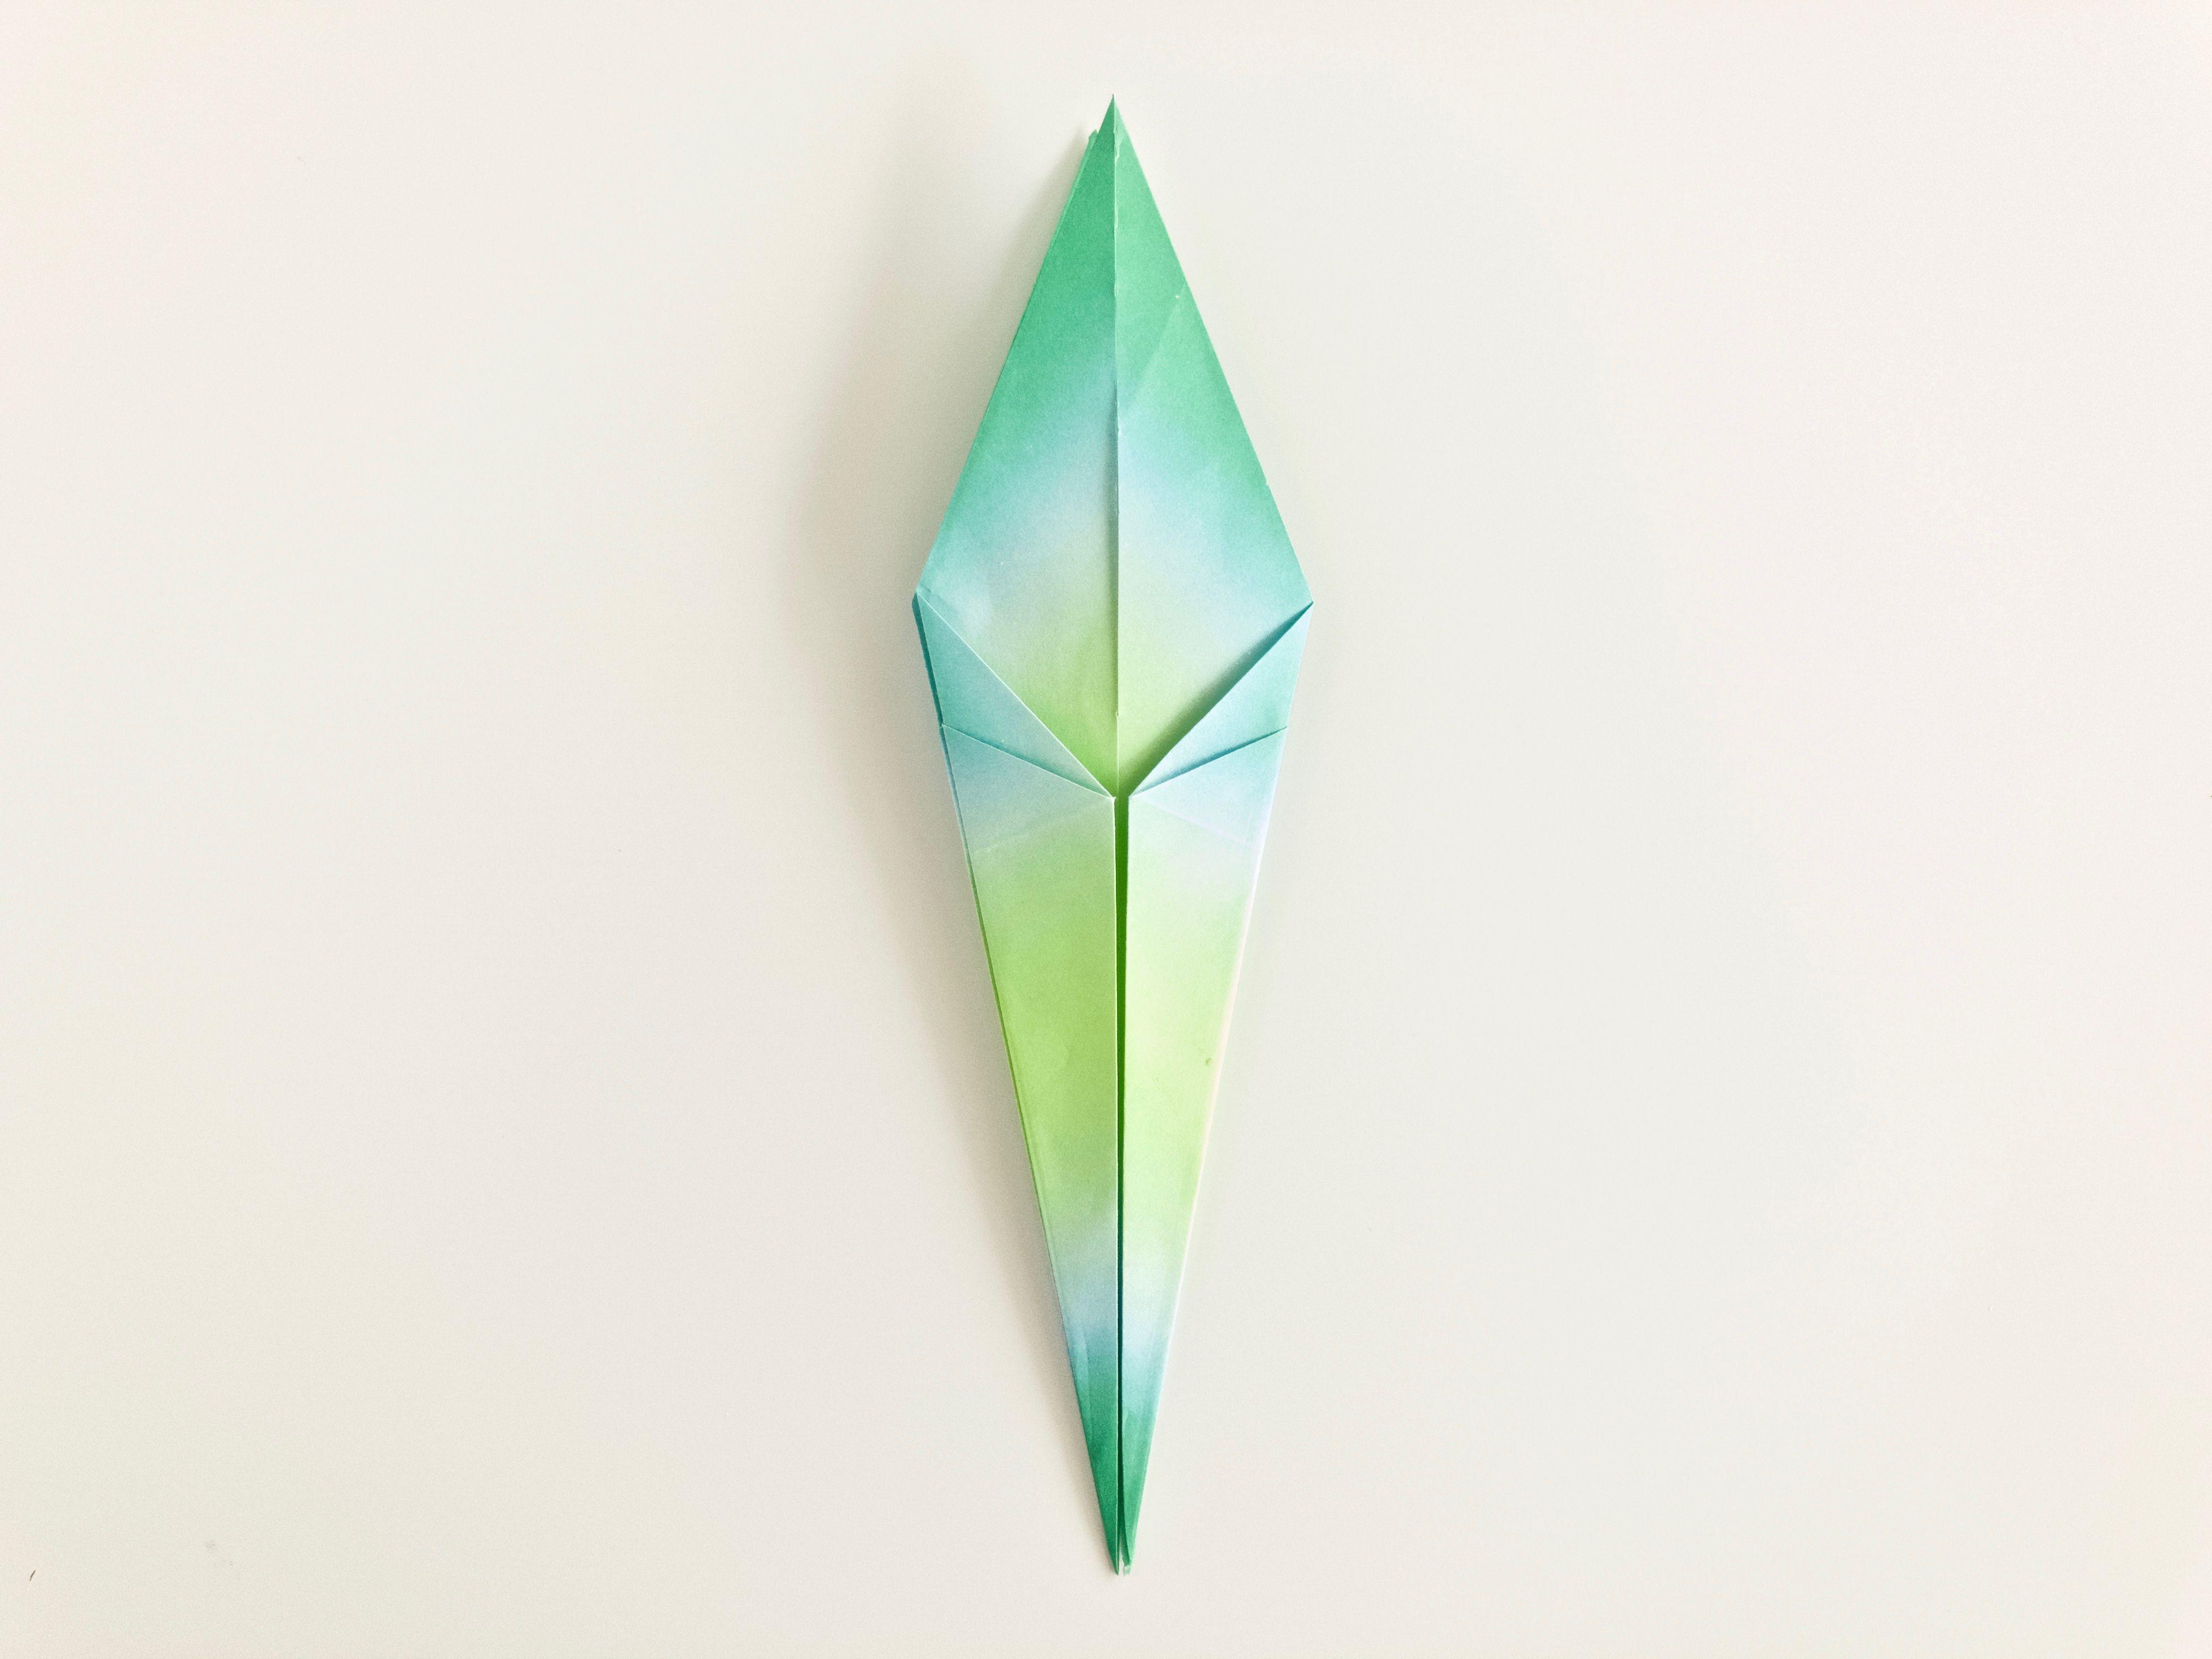 swan origami | Origami swan instructions, Origami diagrams ... | 3024x4032